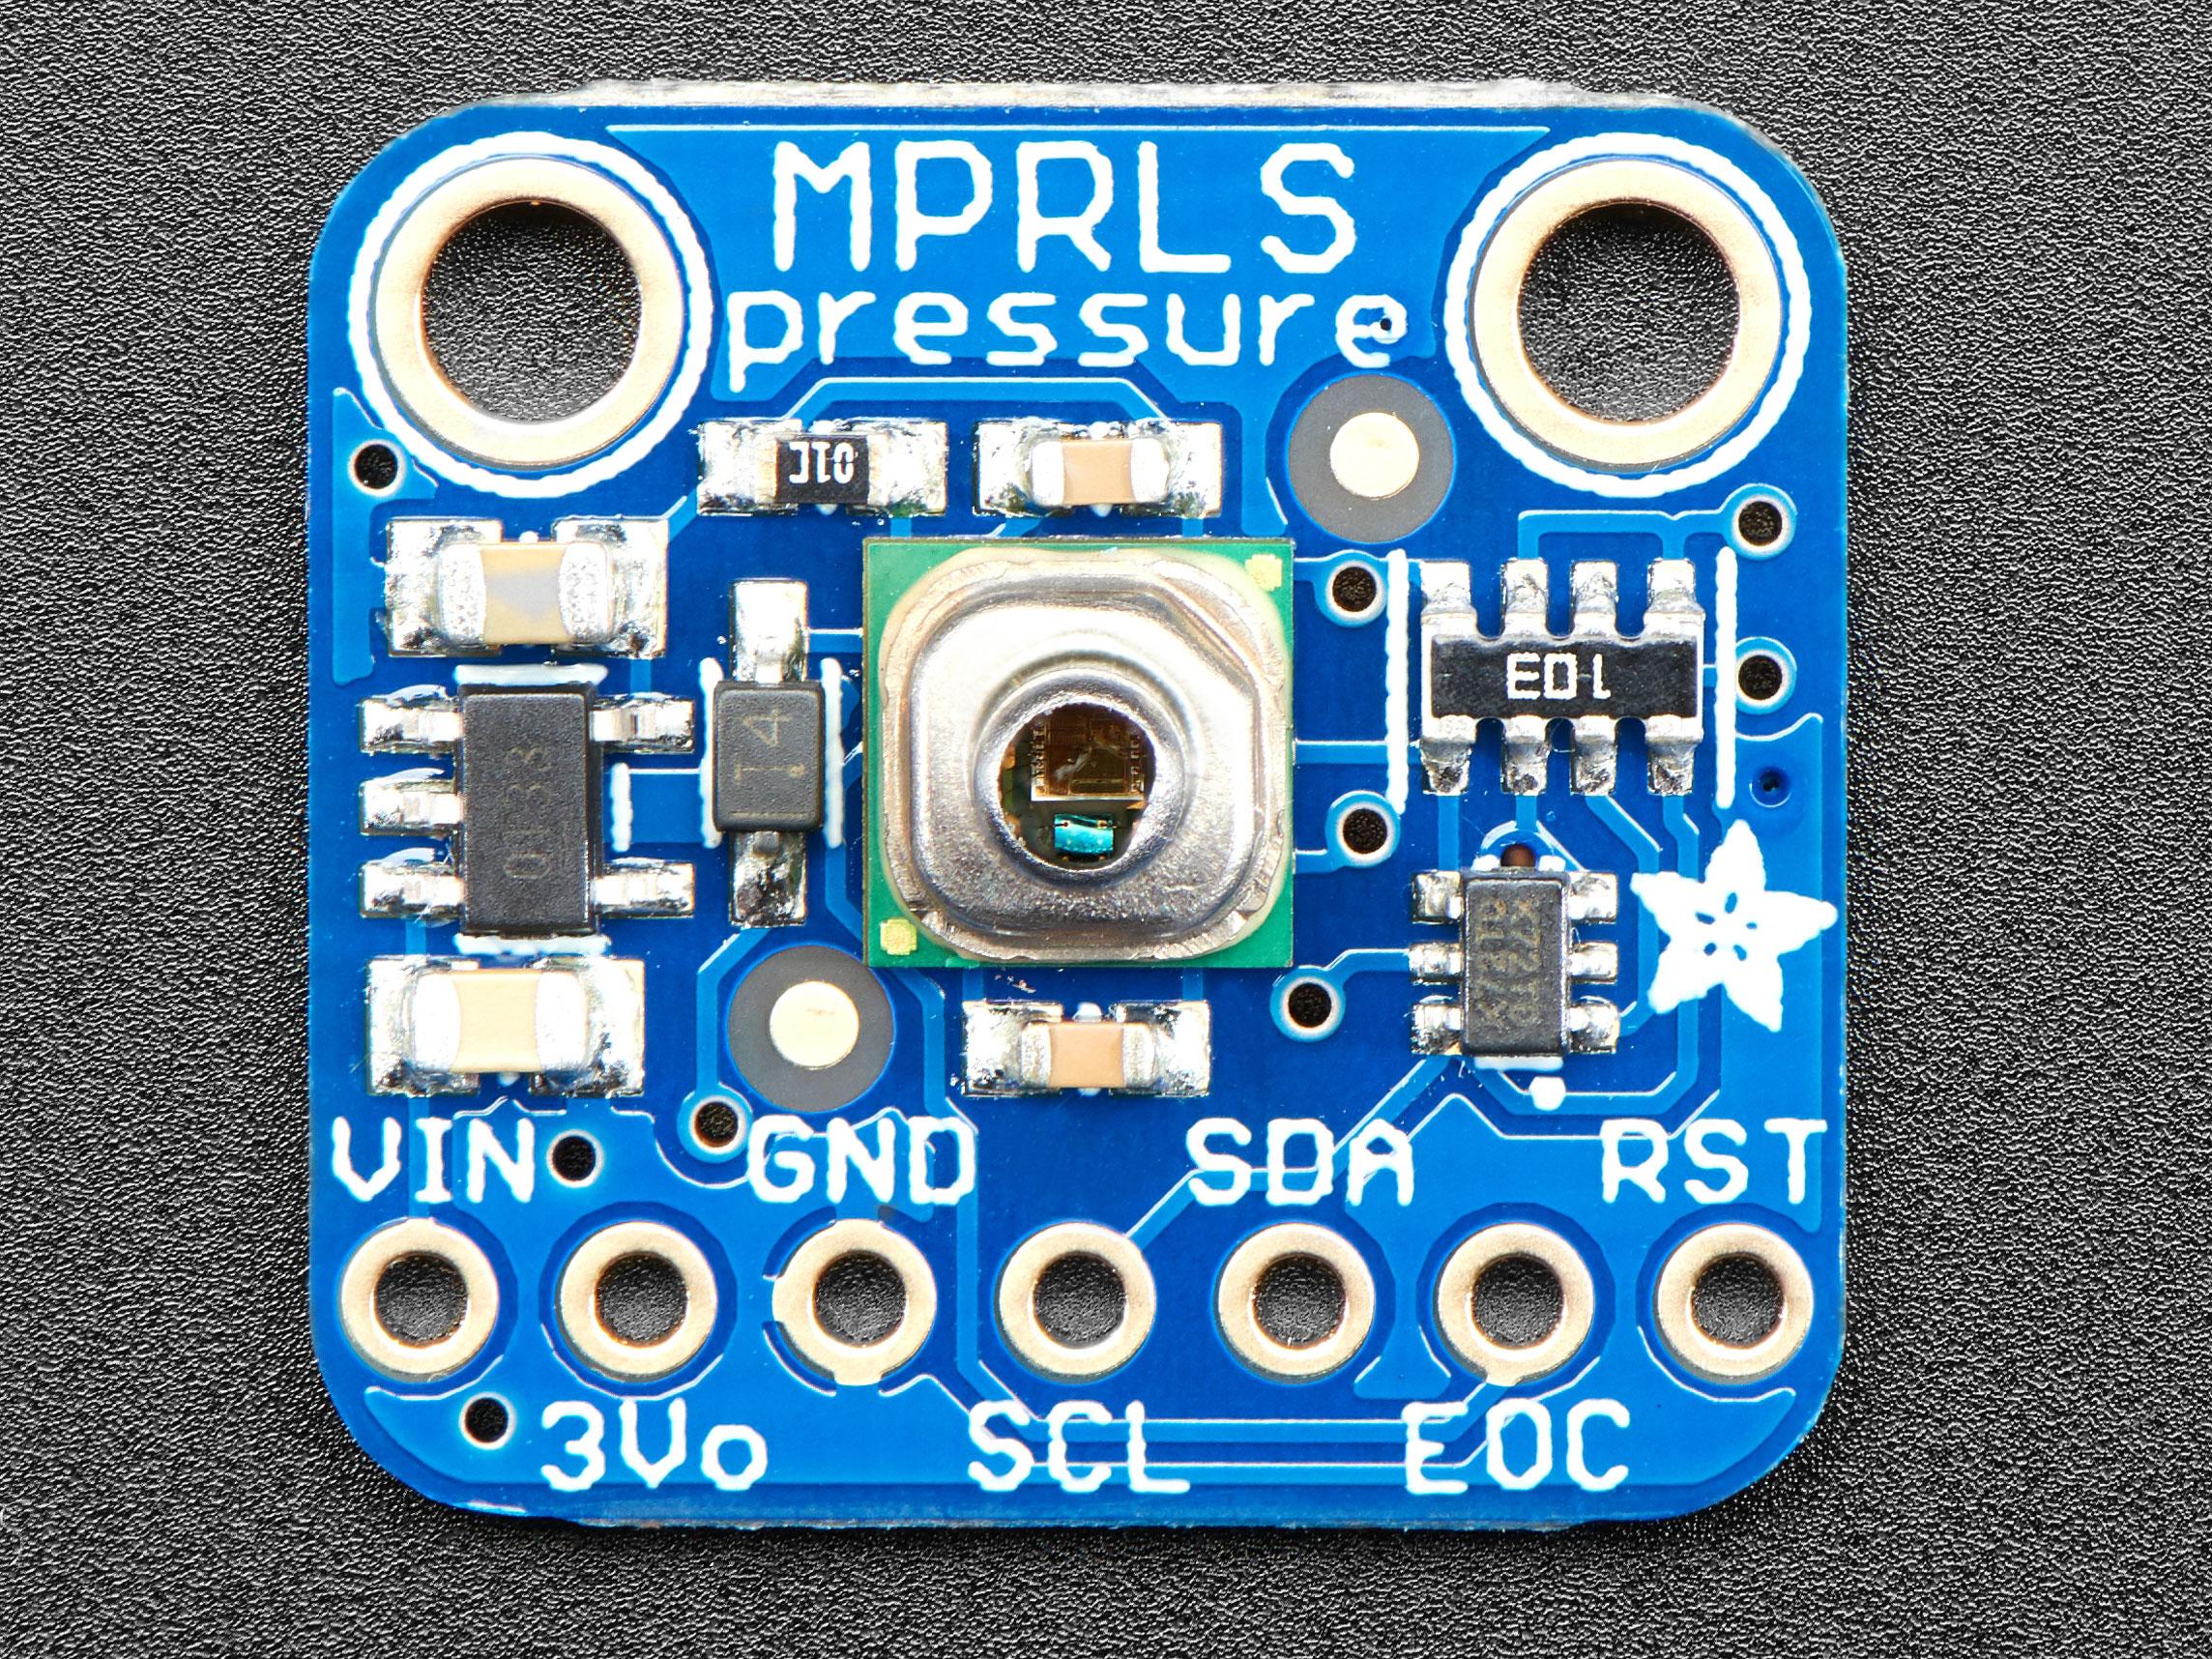 adafruit_products_mprls.jpg